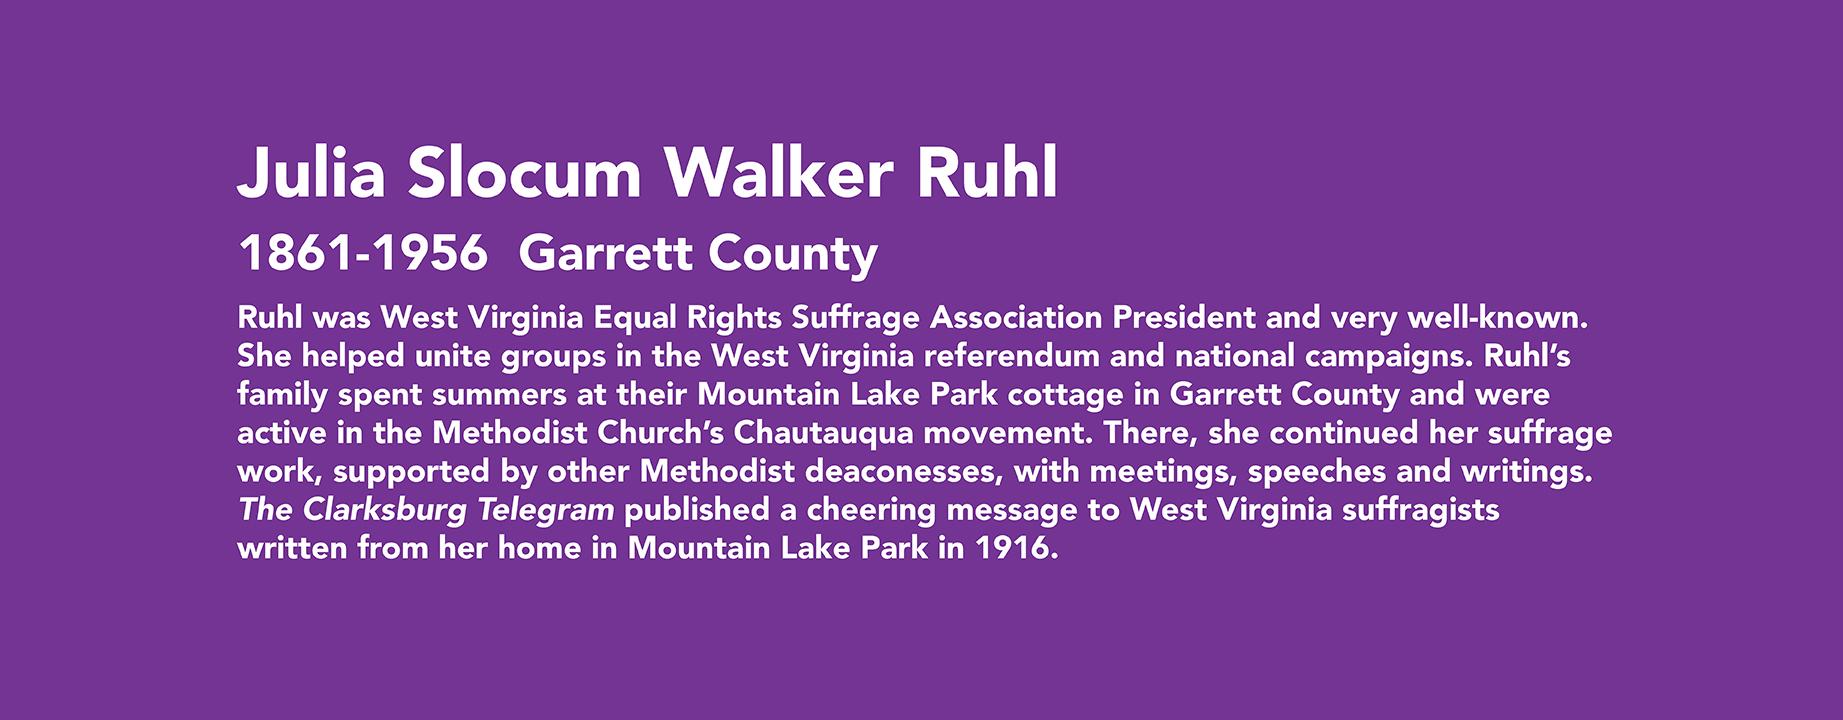 Julia Slocum Walker Ruhl